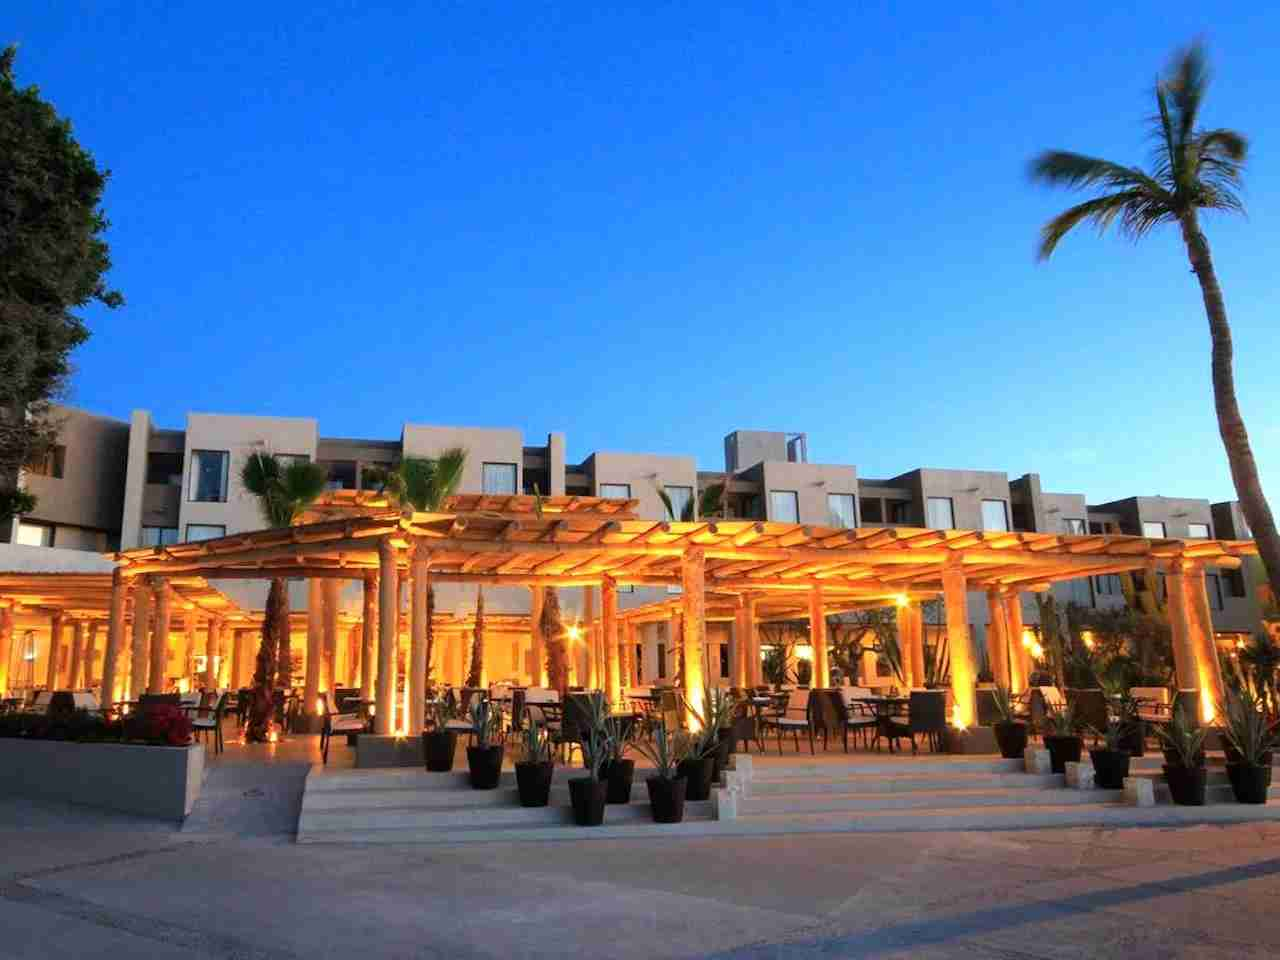 Holiday Inn Resort Los Cabos. Photo courtesy of Holiday Inn Hotels.